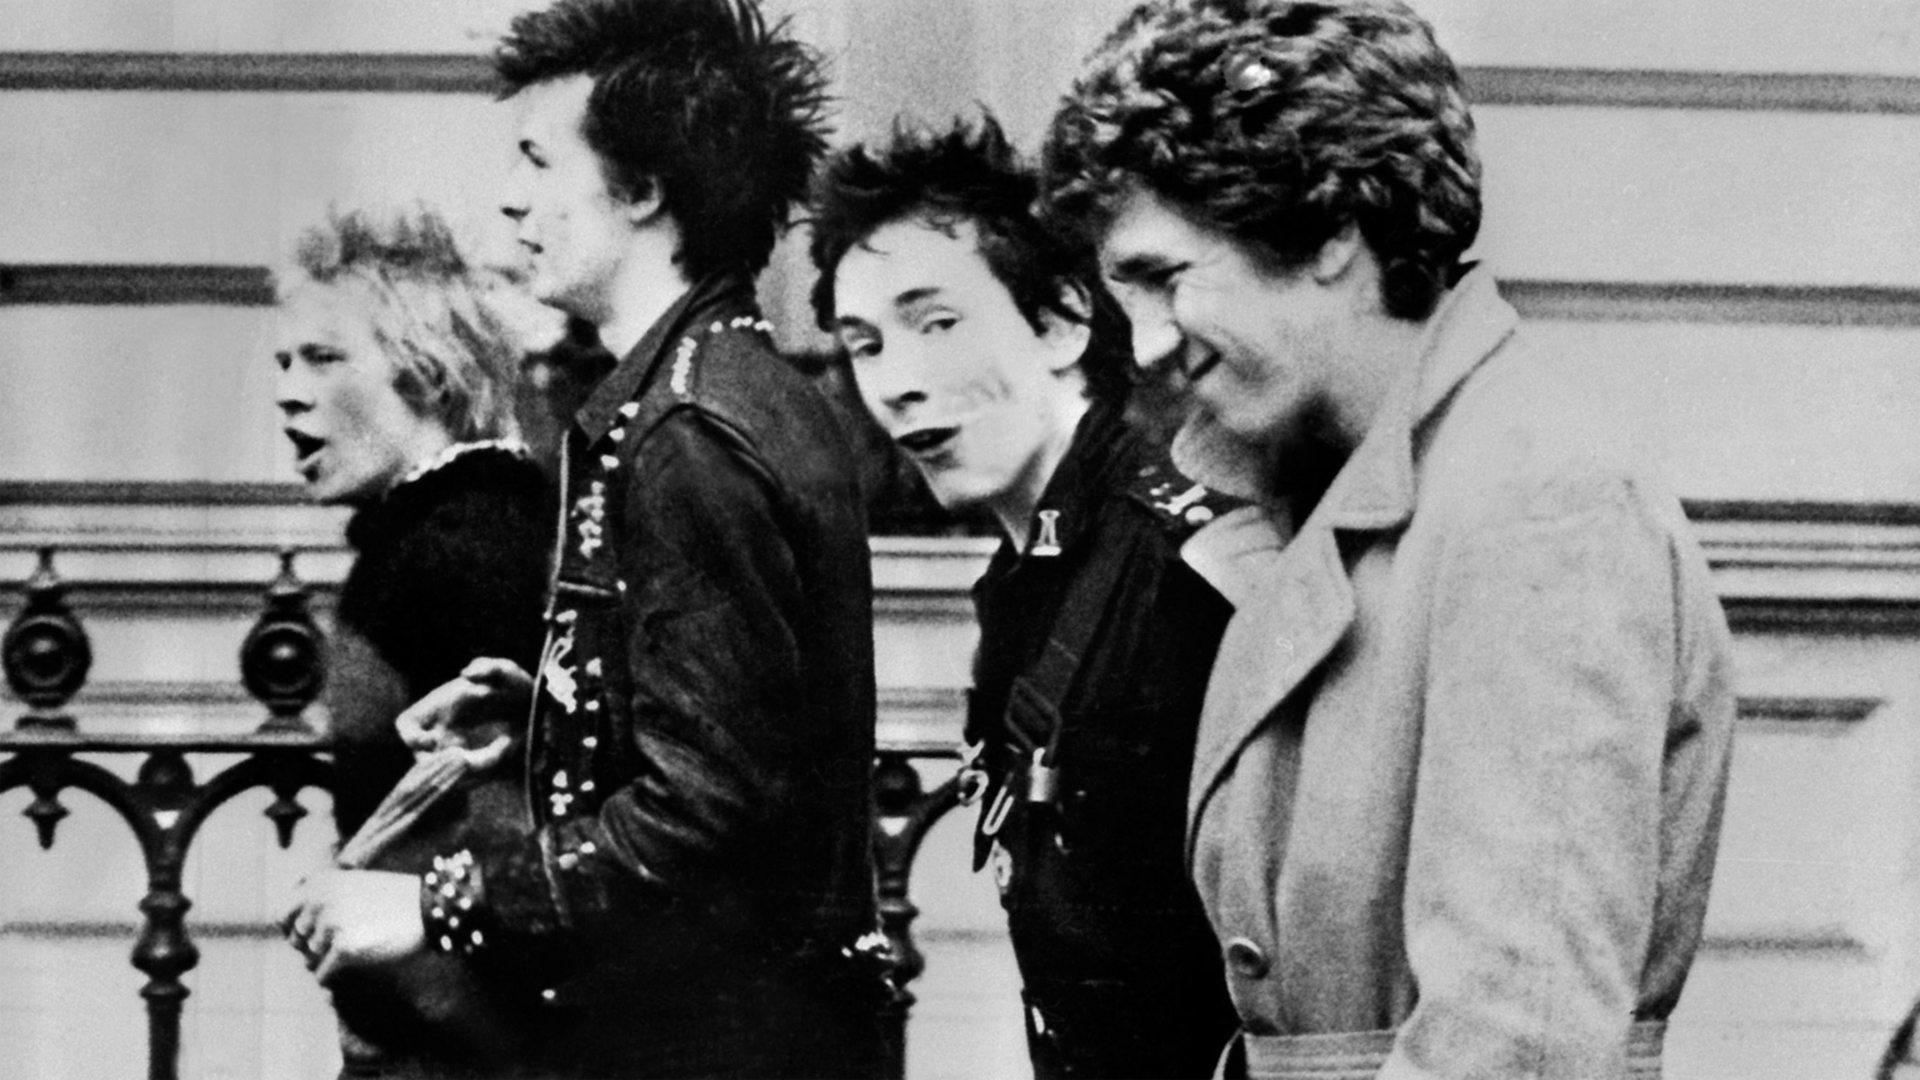 Radcliffe and Maconie, Sex Pistols' Steve Jones Clips